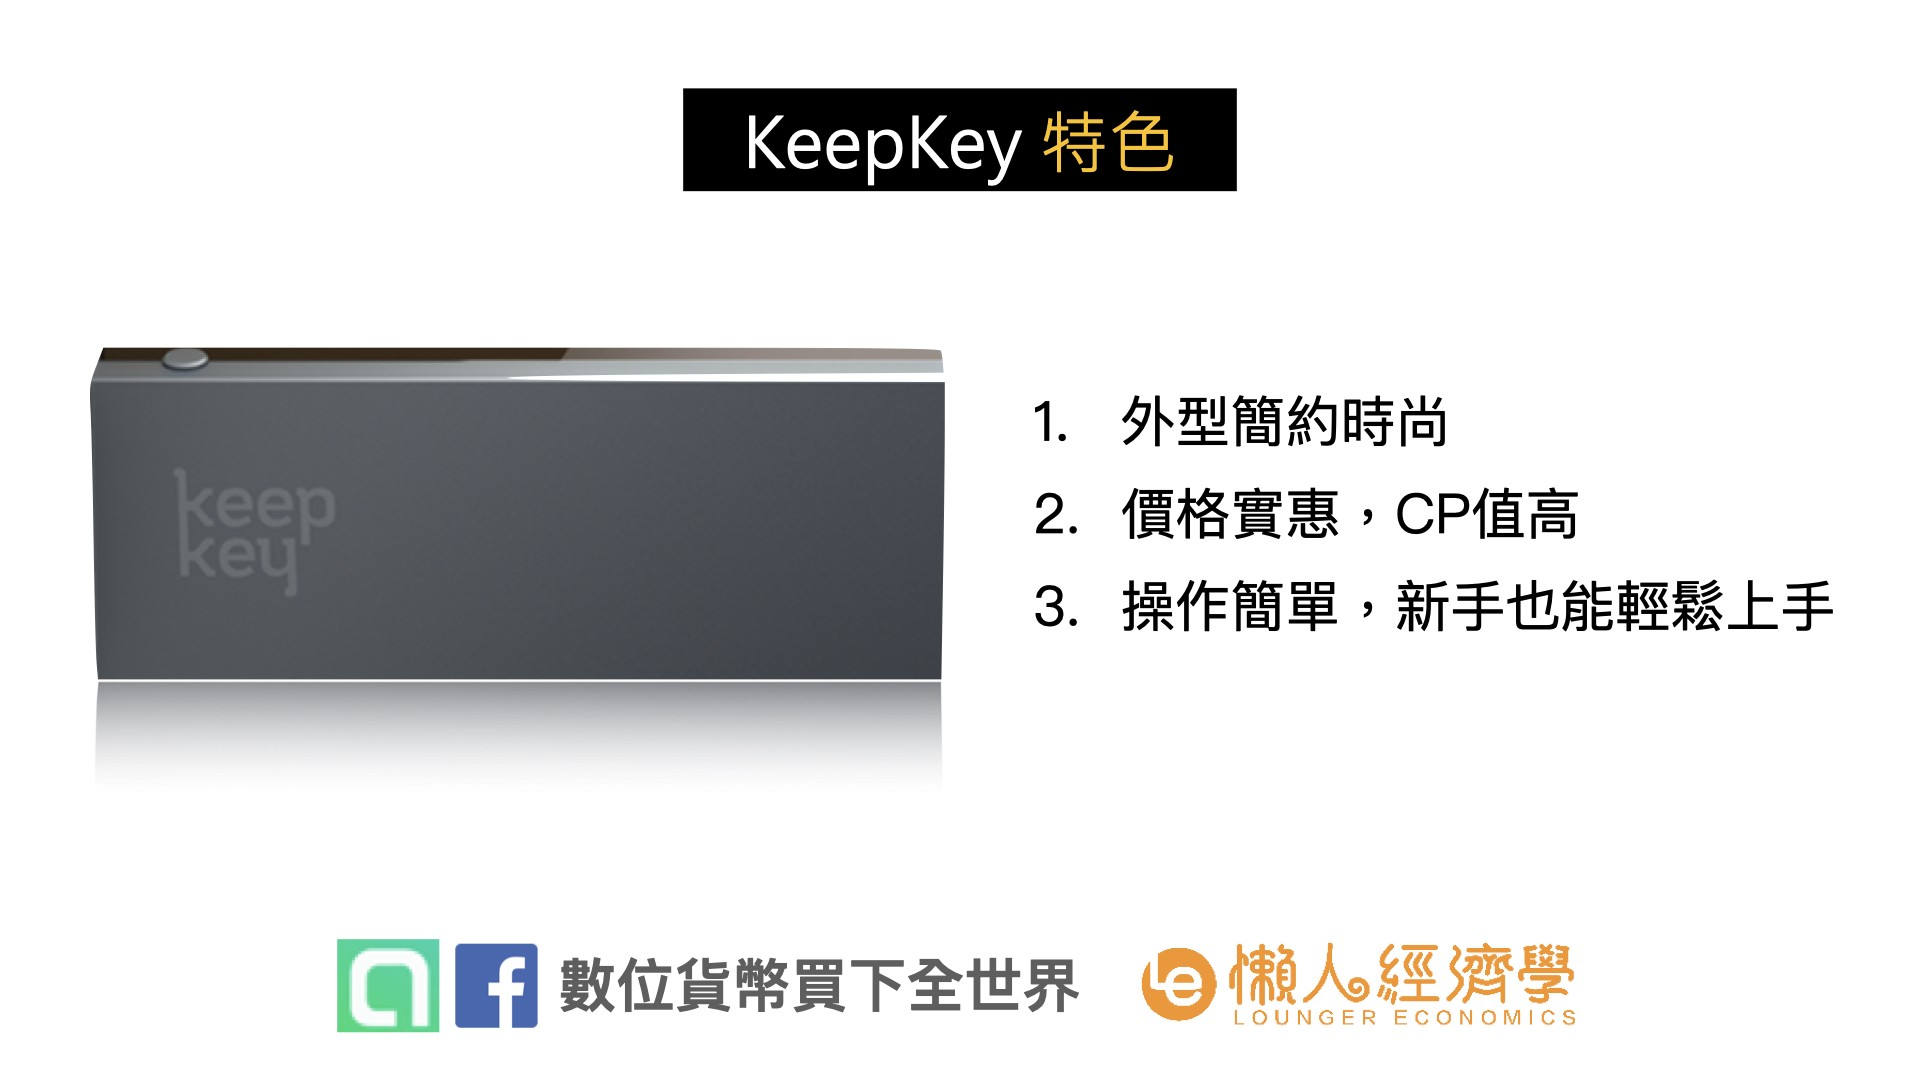 KeepKy 產品介紹